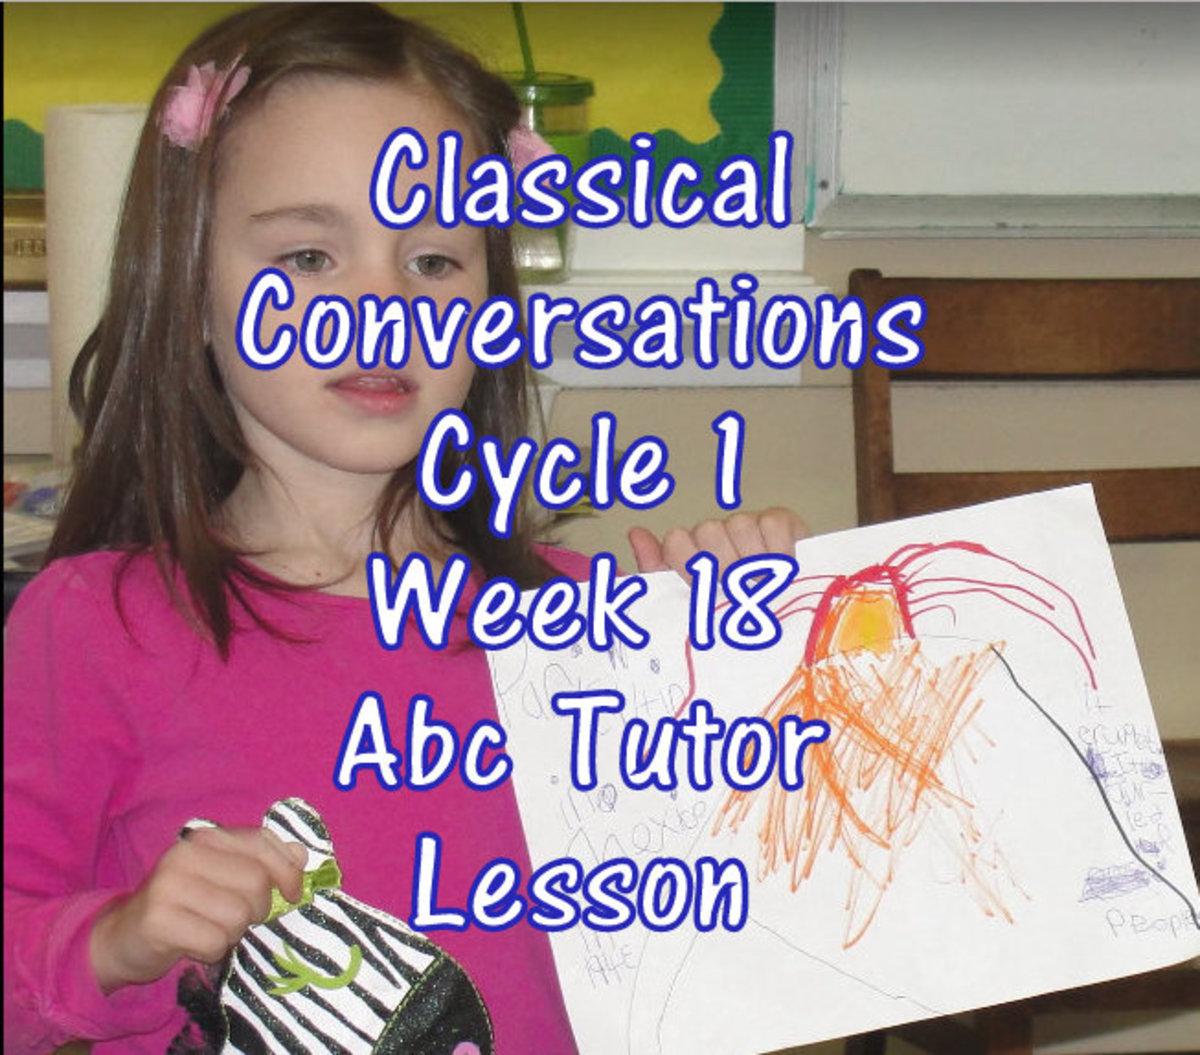 Classical Conversations Cycle 1 Week 18 Abc Tutor Plan